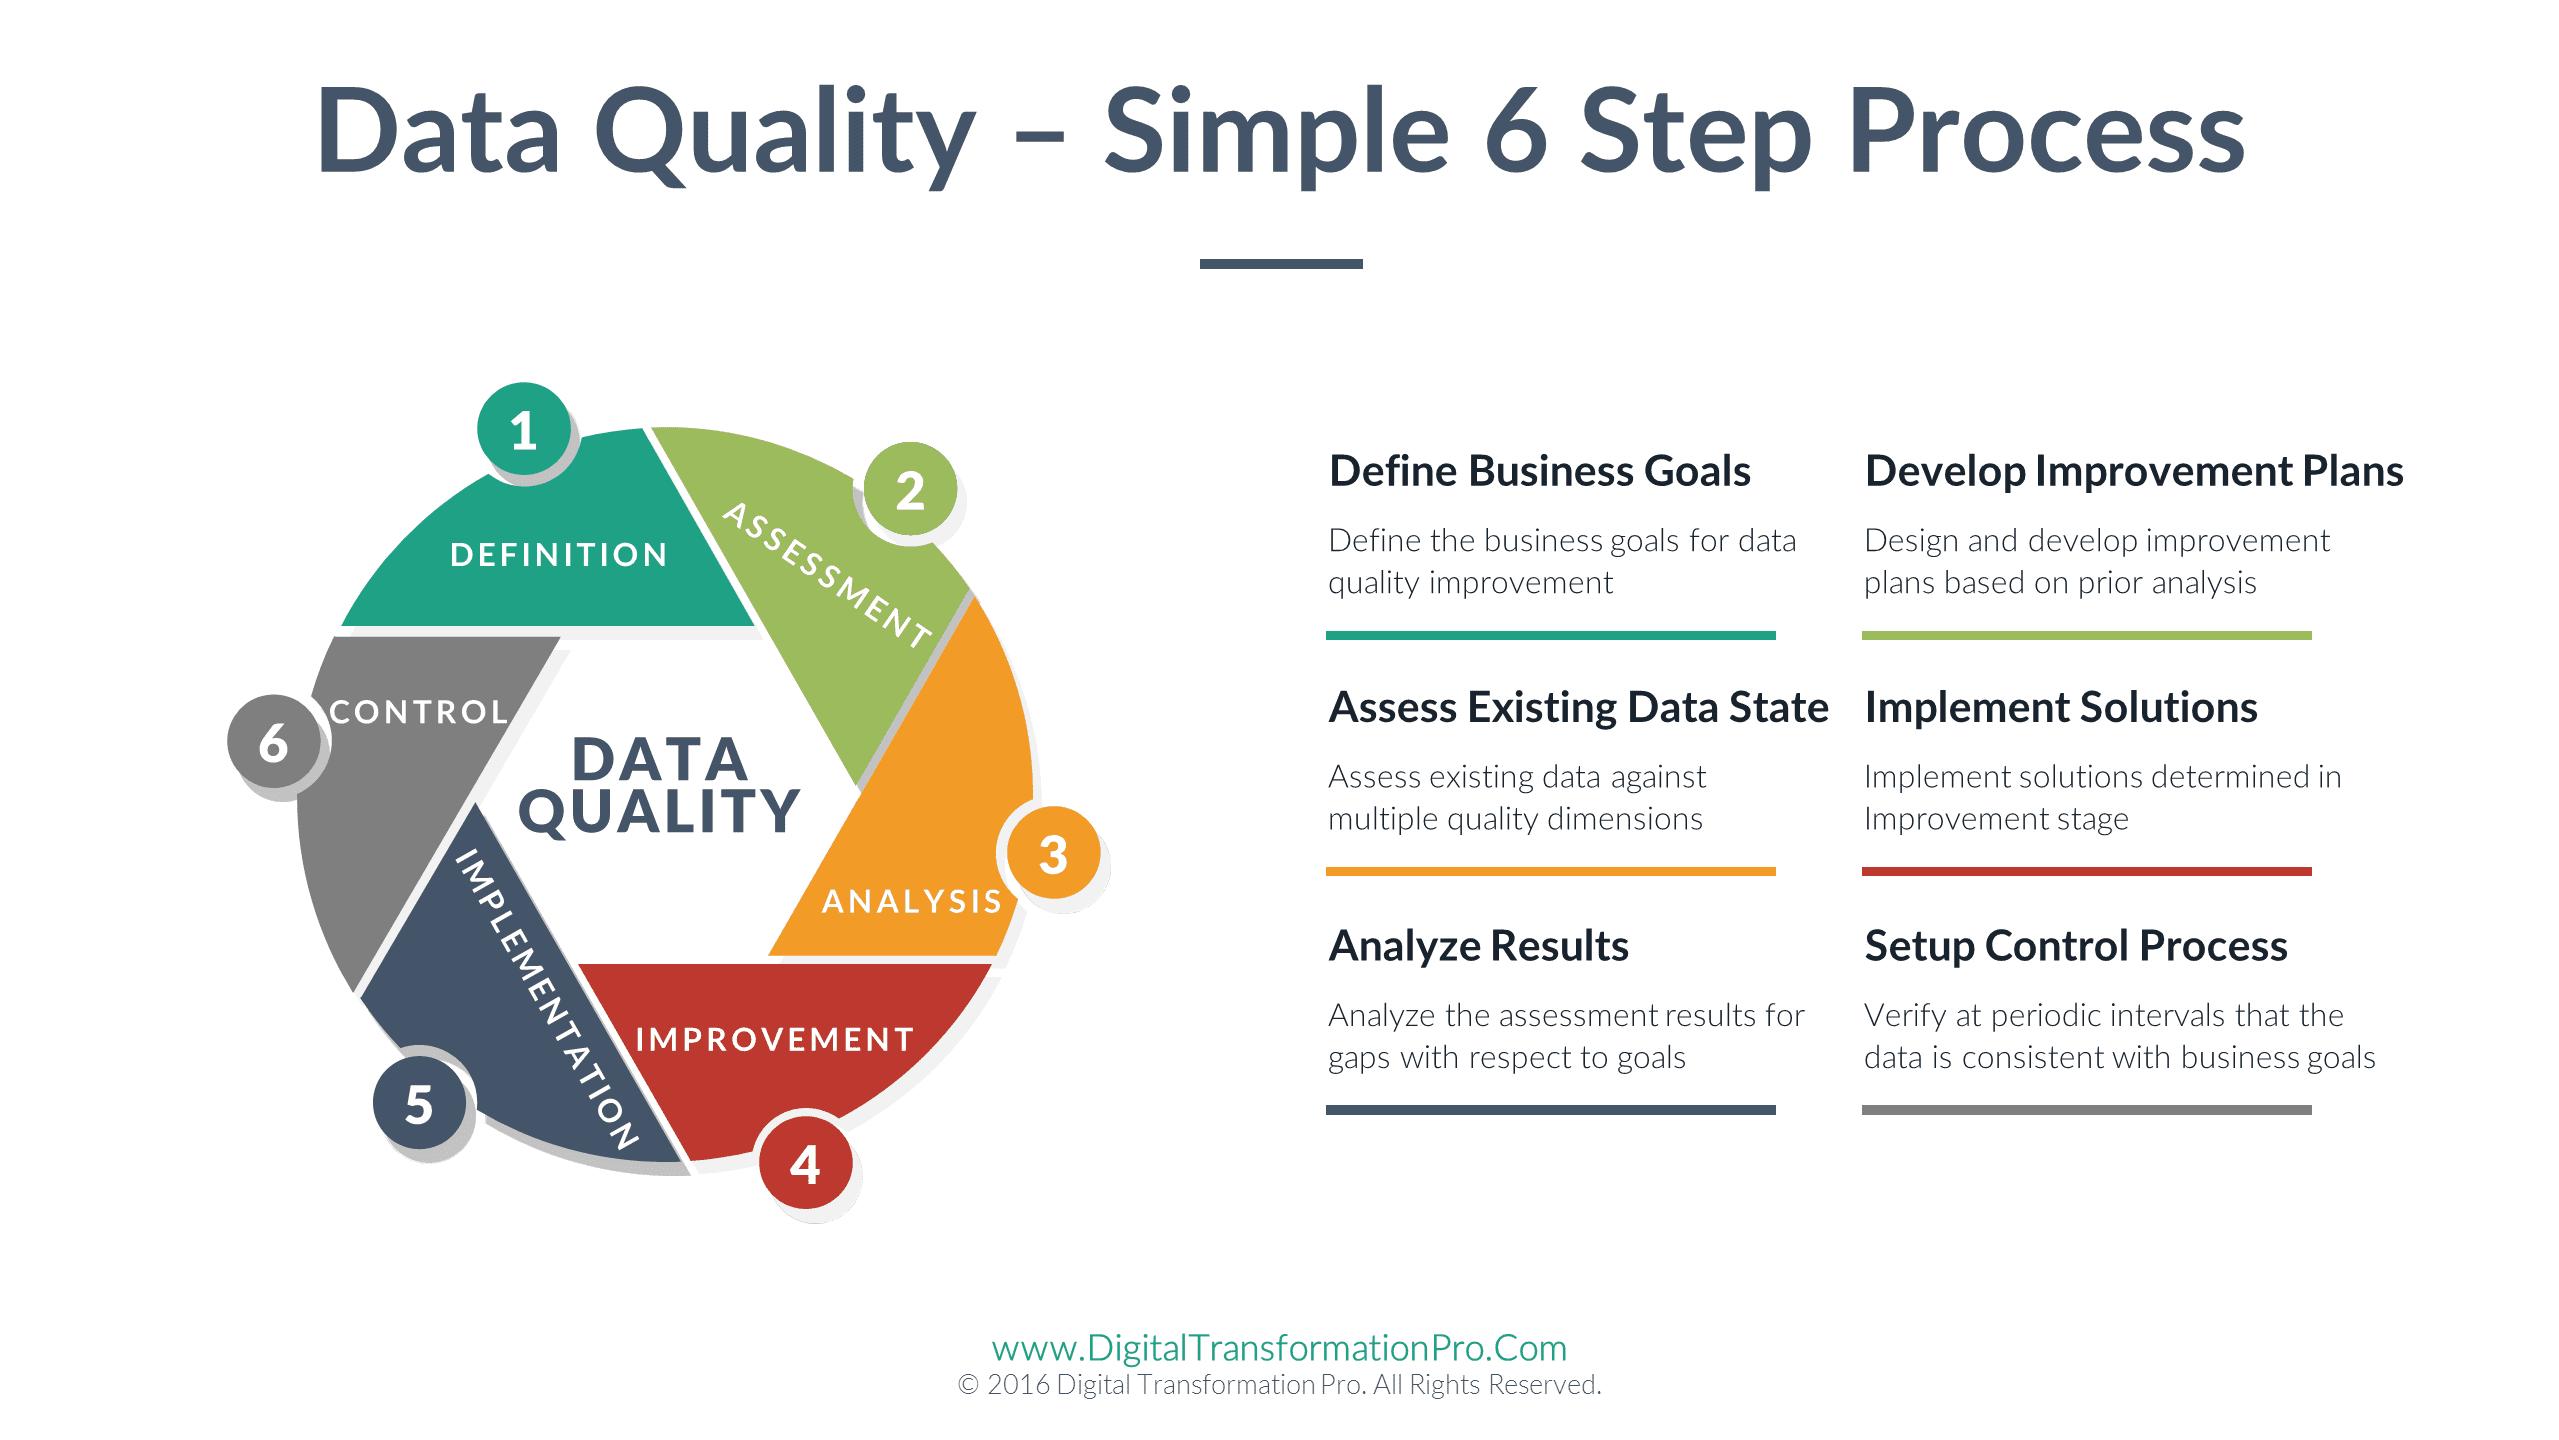 Data Quality 6 Step Dataversity